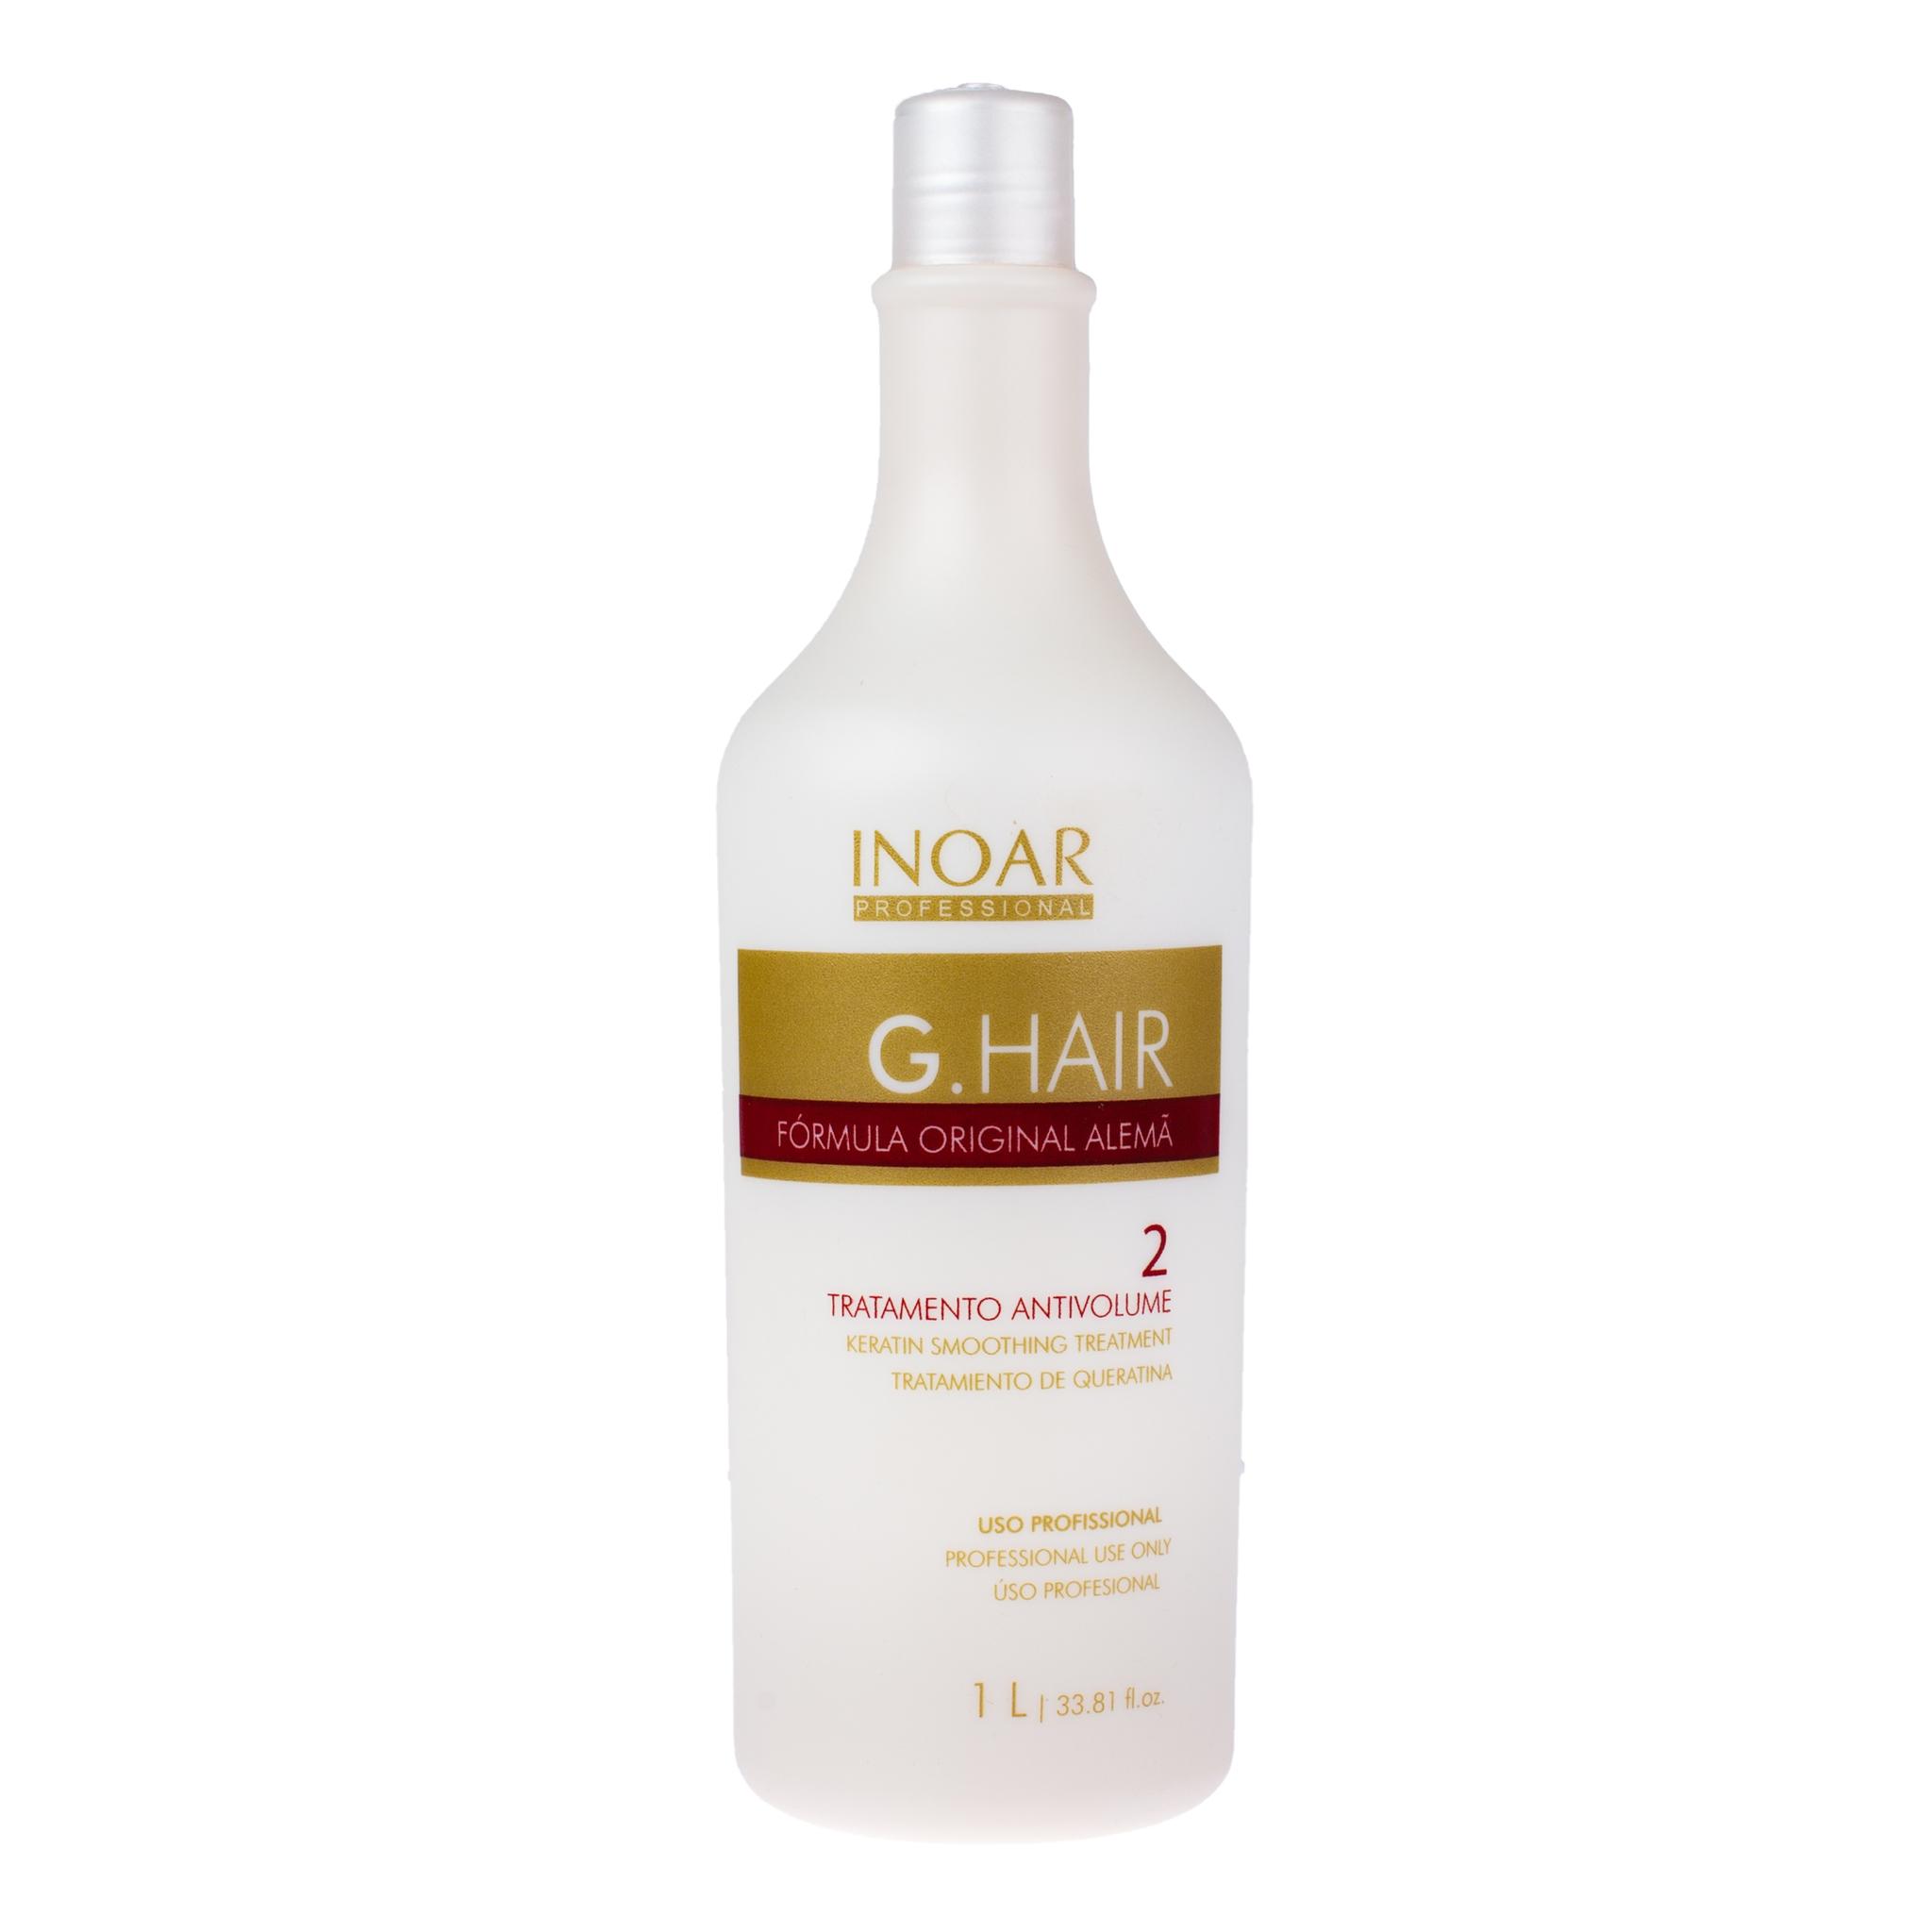 INOAR G Hair 1L